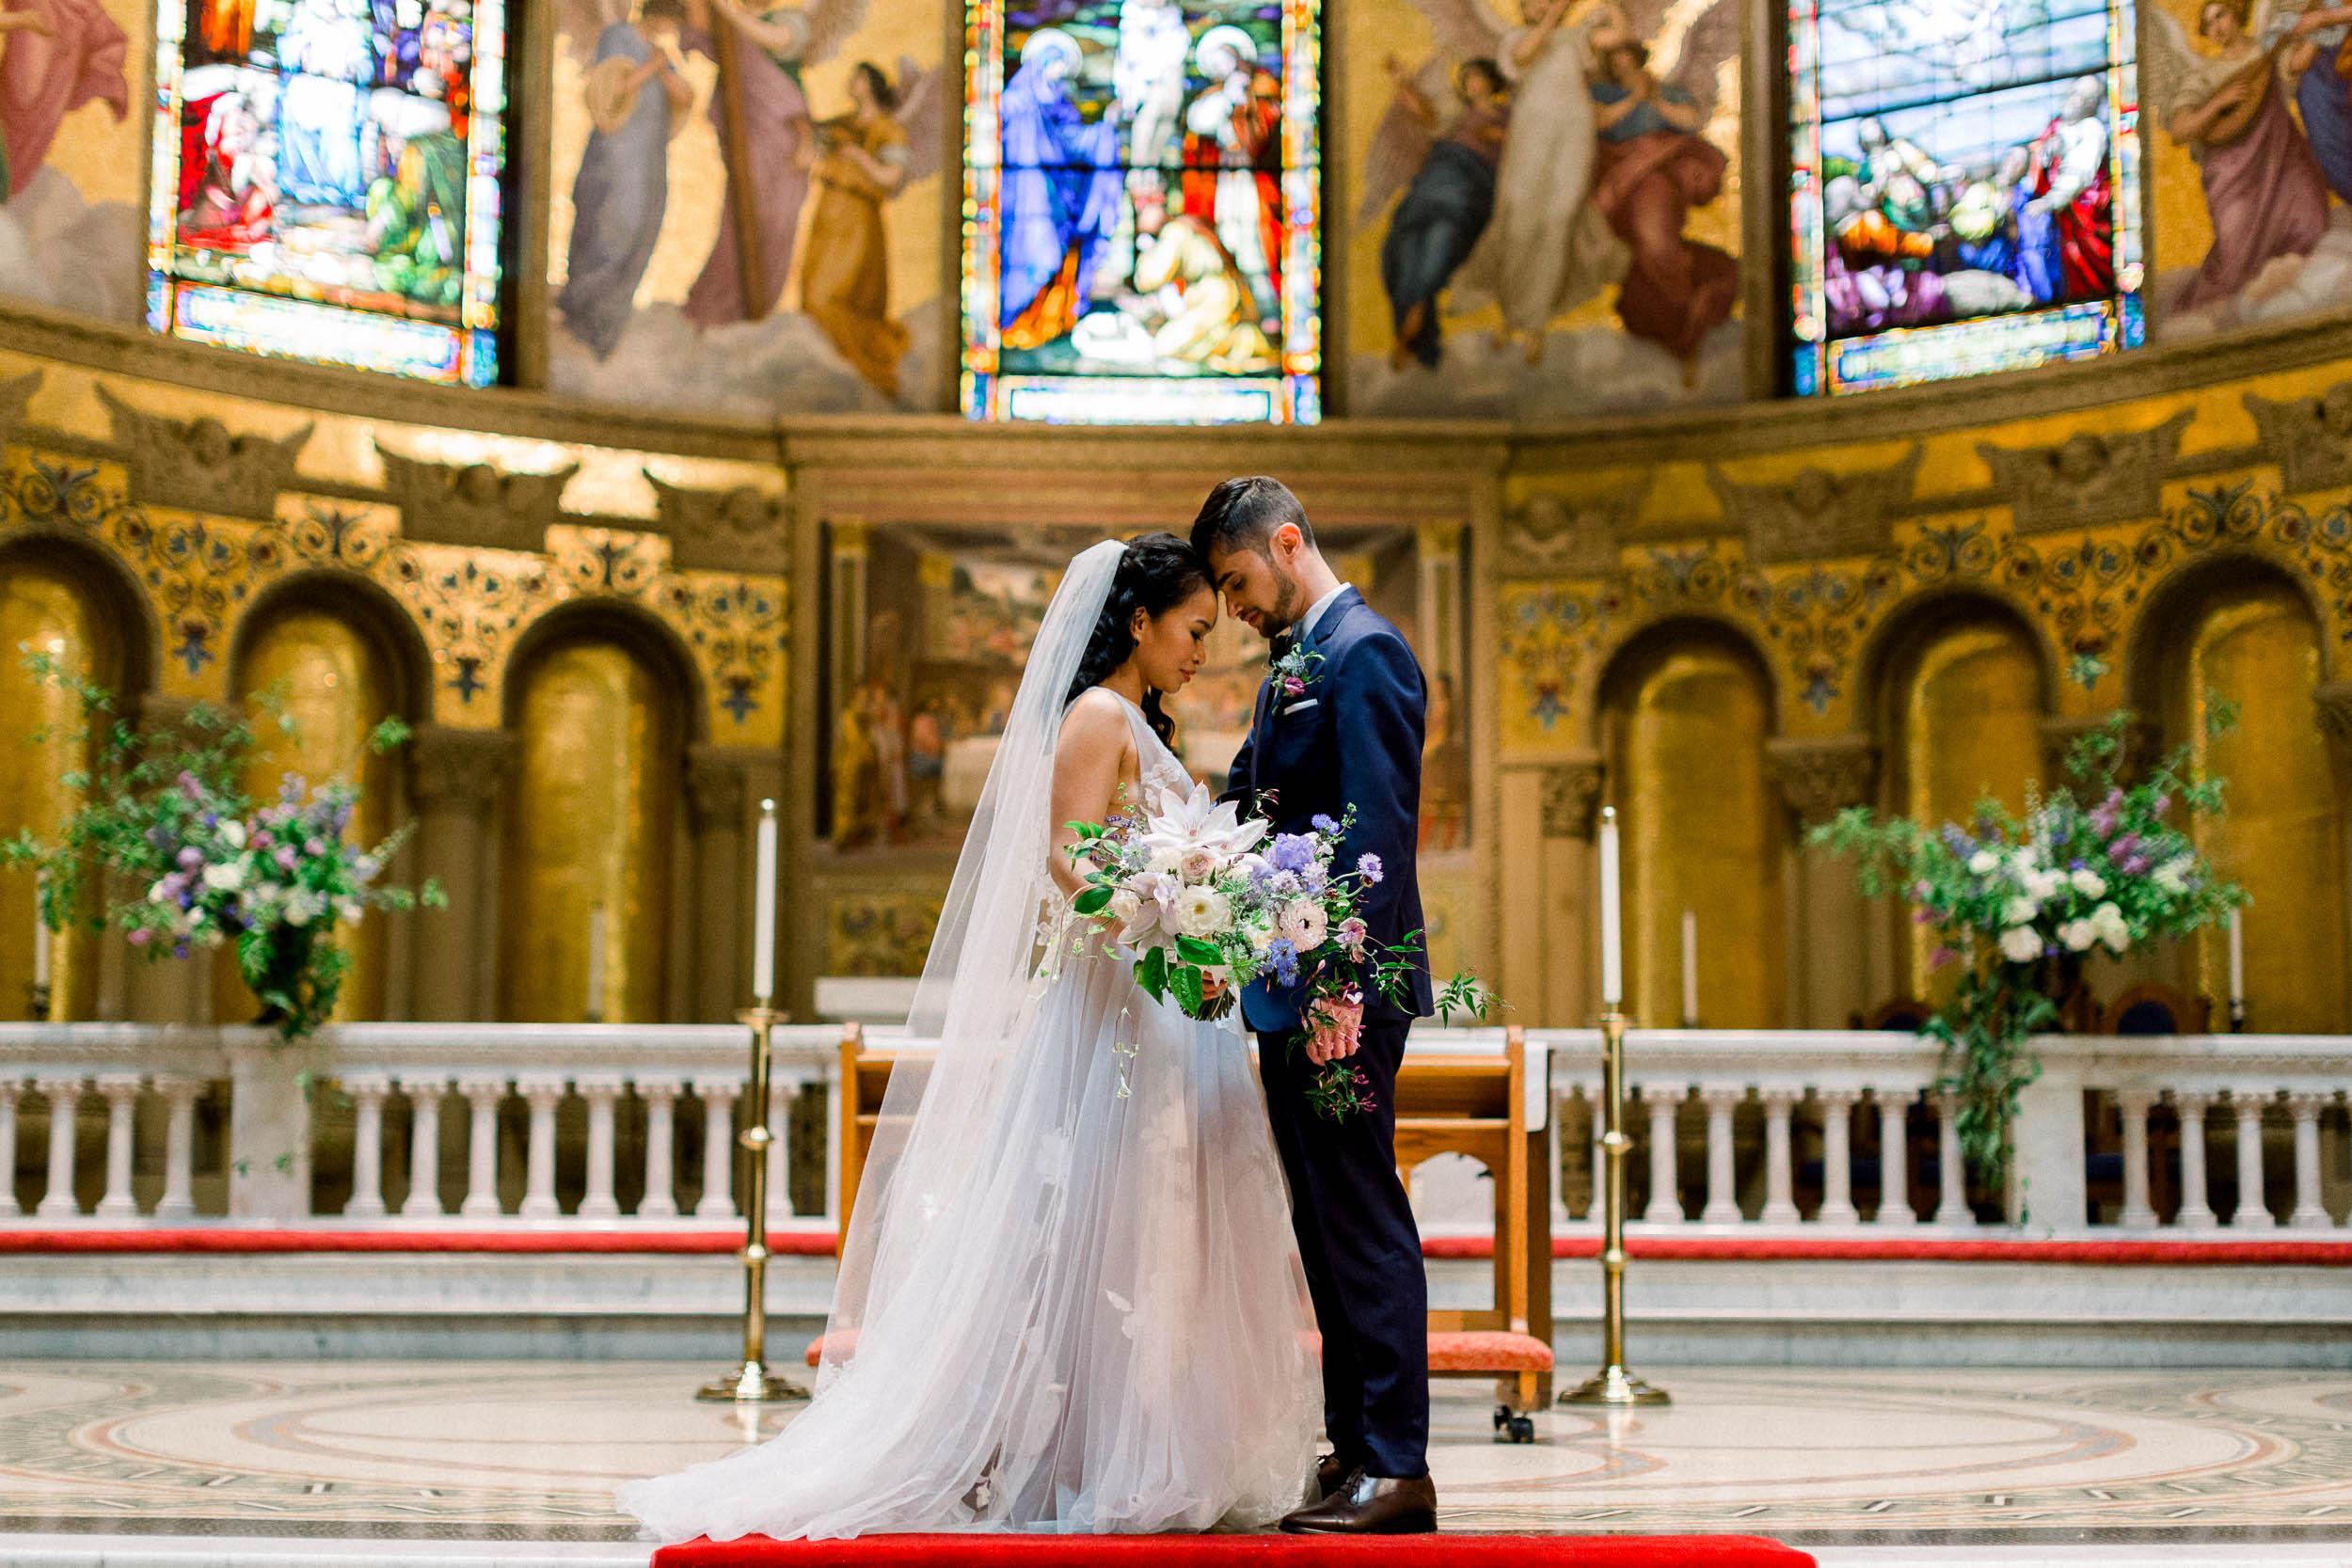 052519_B+S_Hidden Villa Wedding_Buena Lane Photography_052519_0234CY.jpg